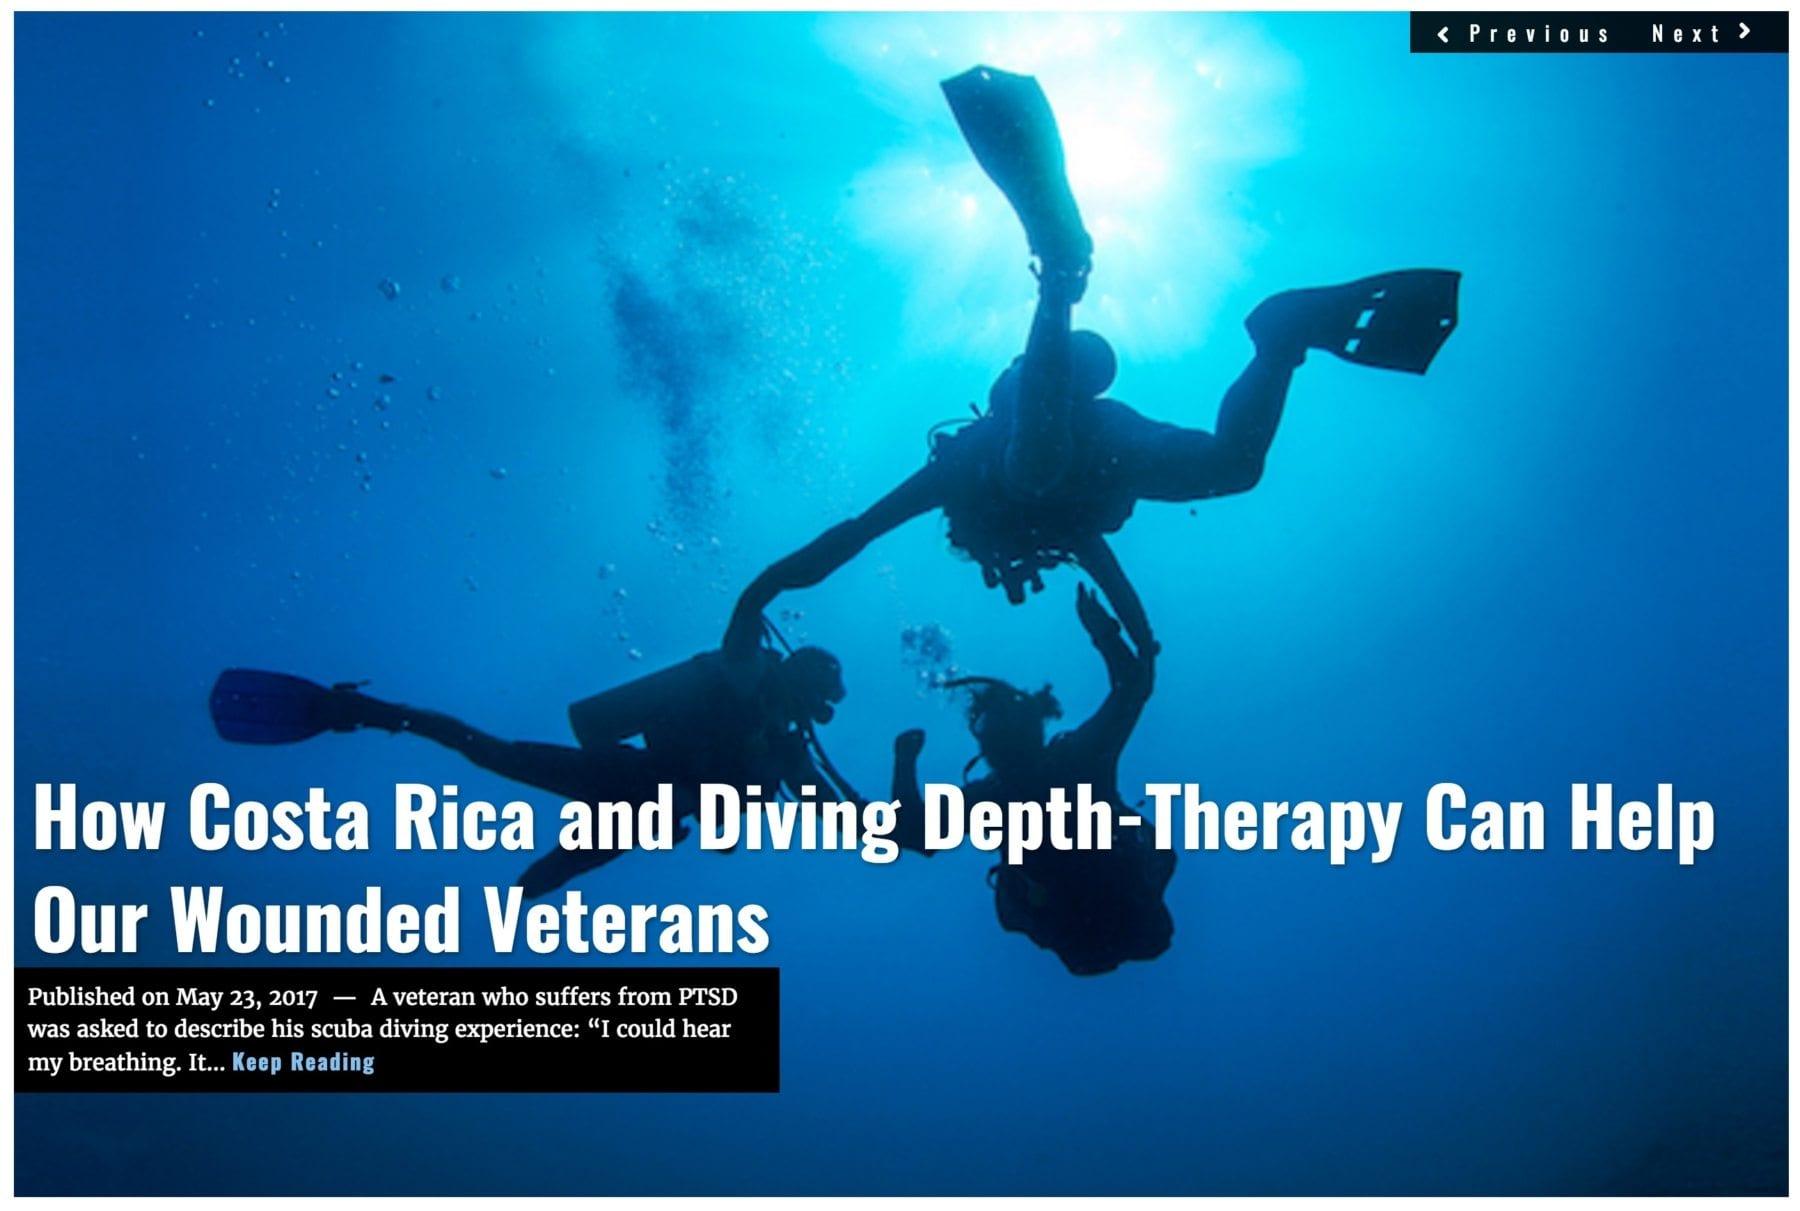 Image Lima Charlie News Headline Deep Sea Diving Therapy MAY 23 2017